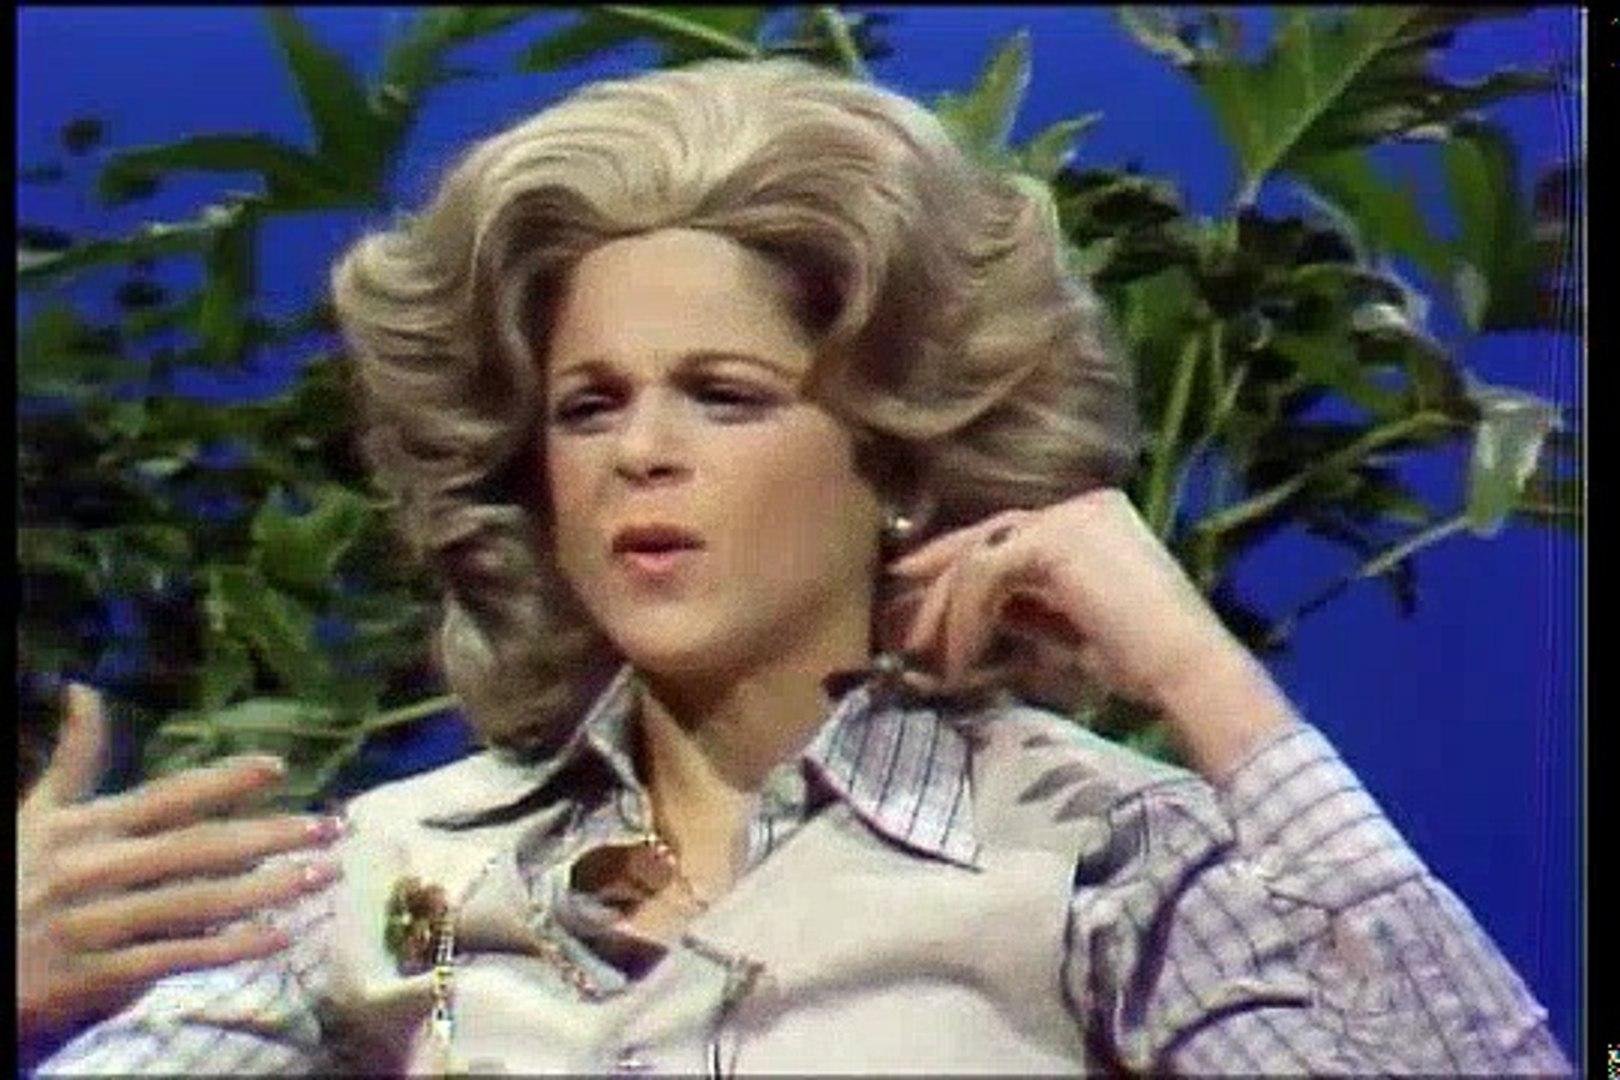 Saturday Night Live S02 E04 Karen Black John Prine part 1/2